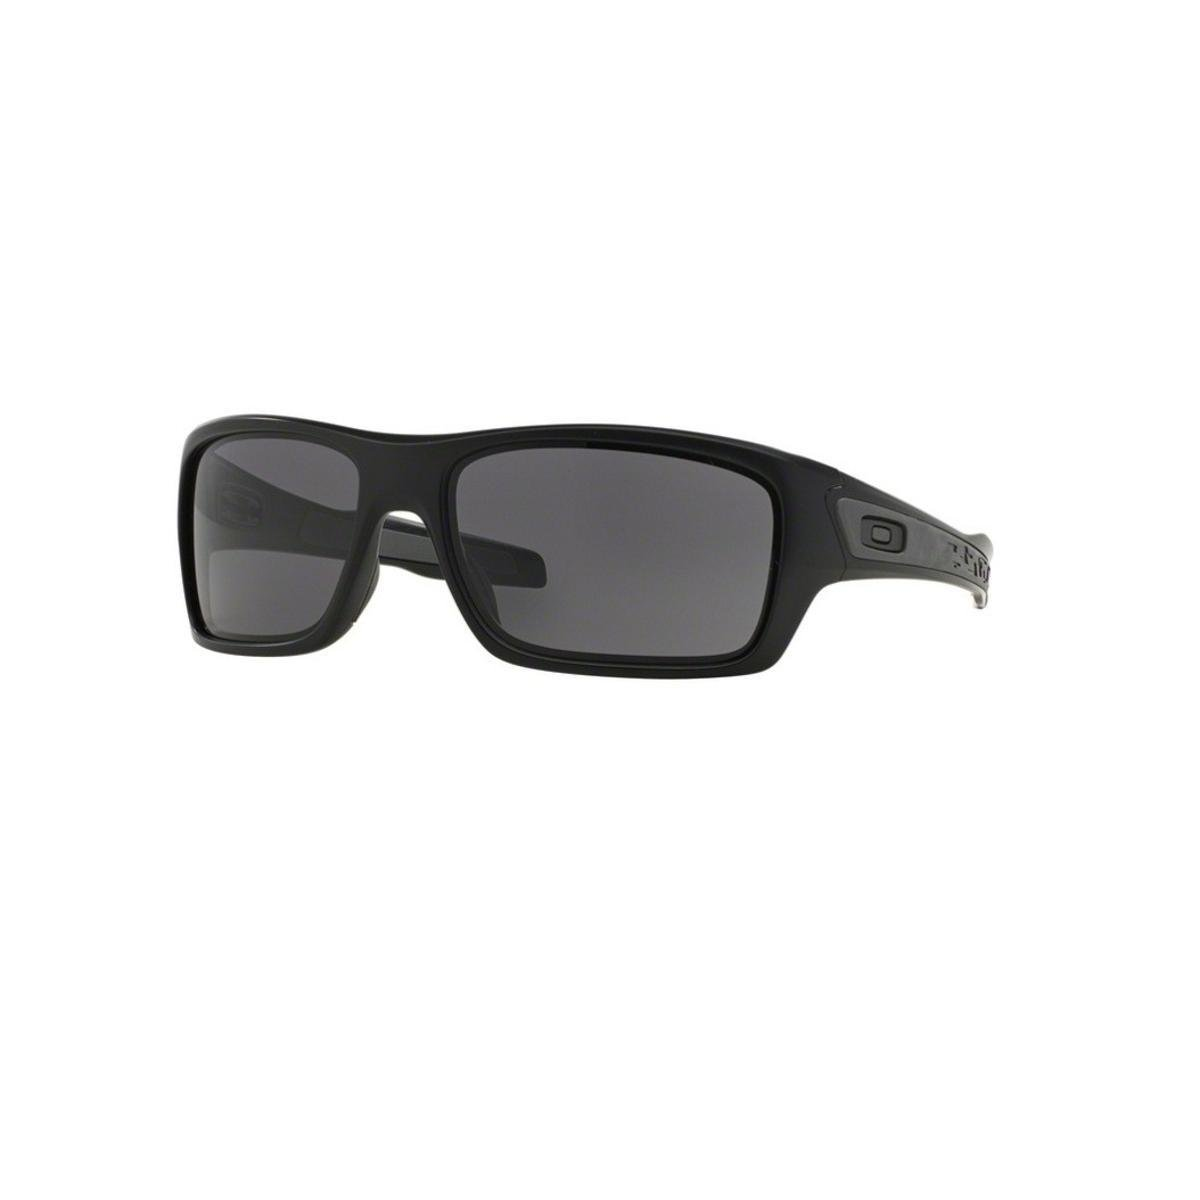 Óculos Oakley Turbine Warm - Cinza - Compre Agora   Zattini 5a13879755